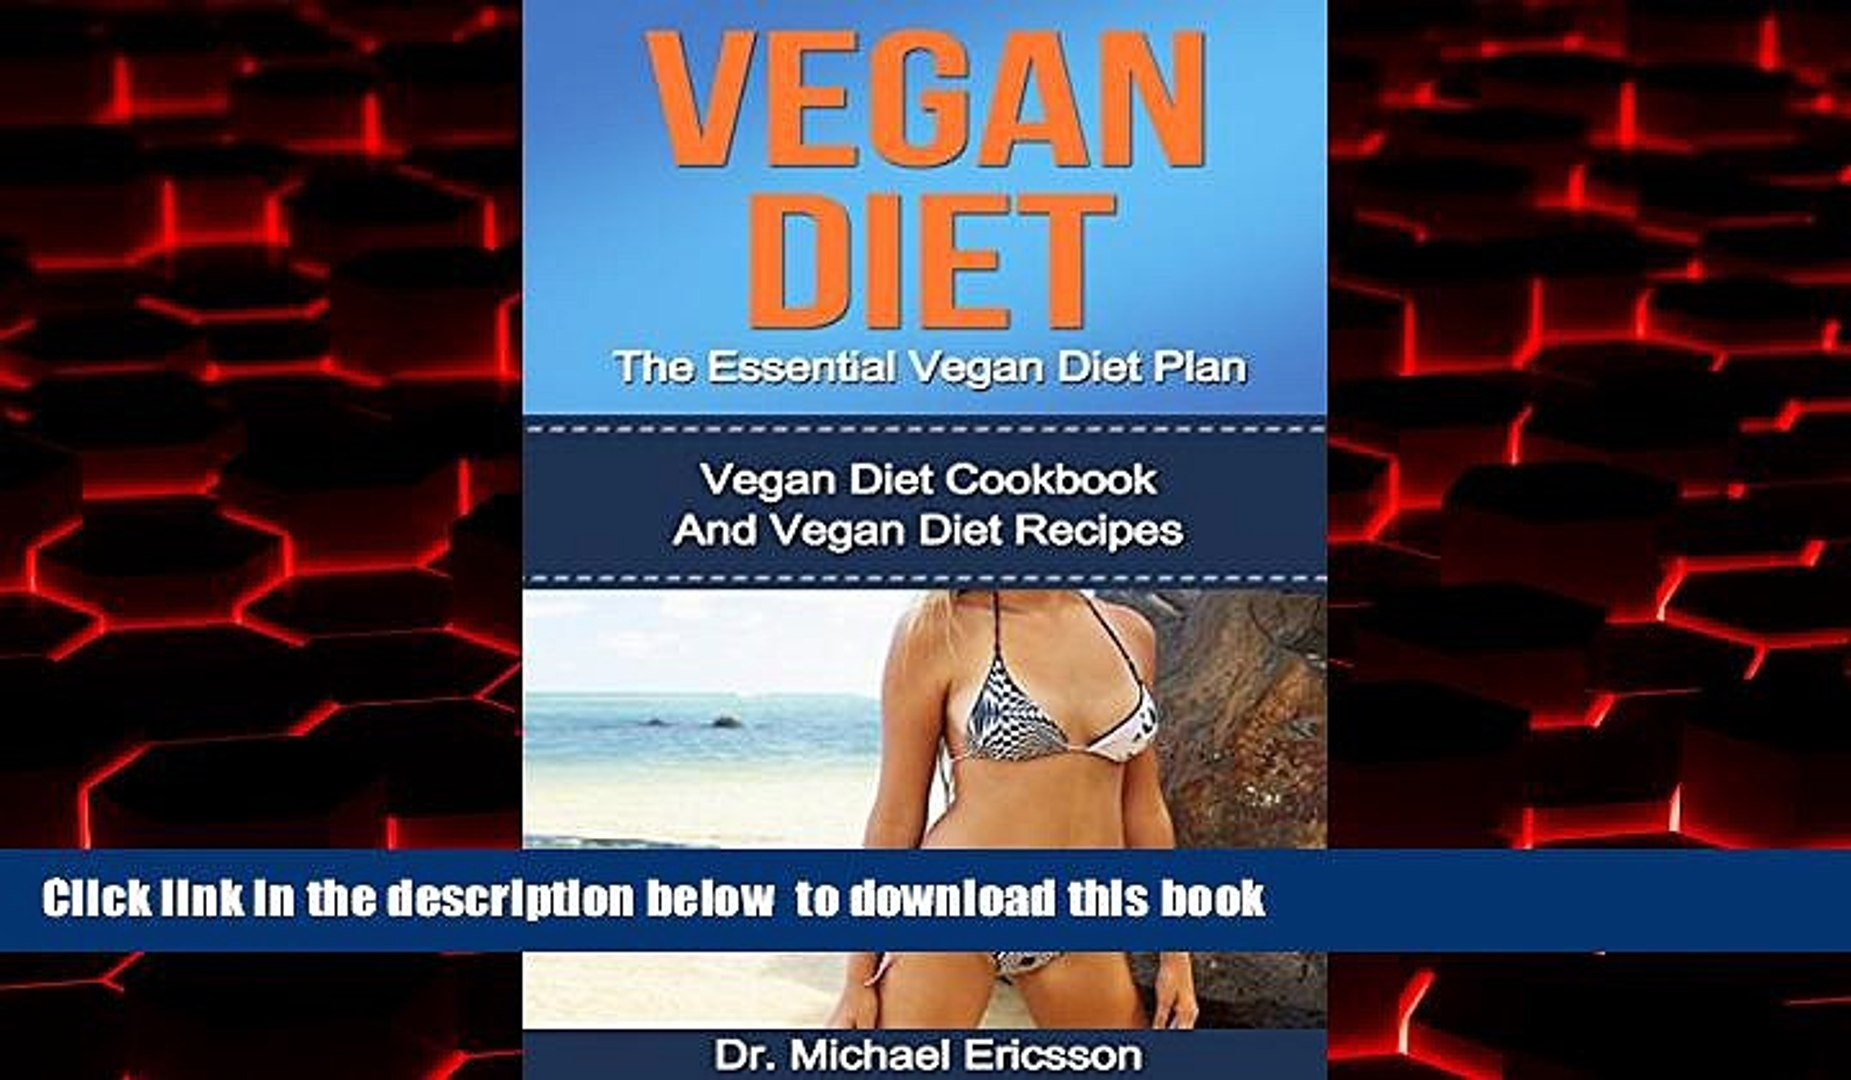 Best book  VEGAN DIET: The Essential Vegan Diet Plan: Vegan Diet Cookbook And Vegan Diet Recipes